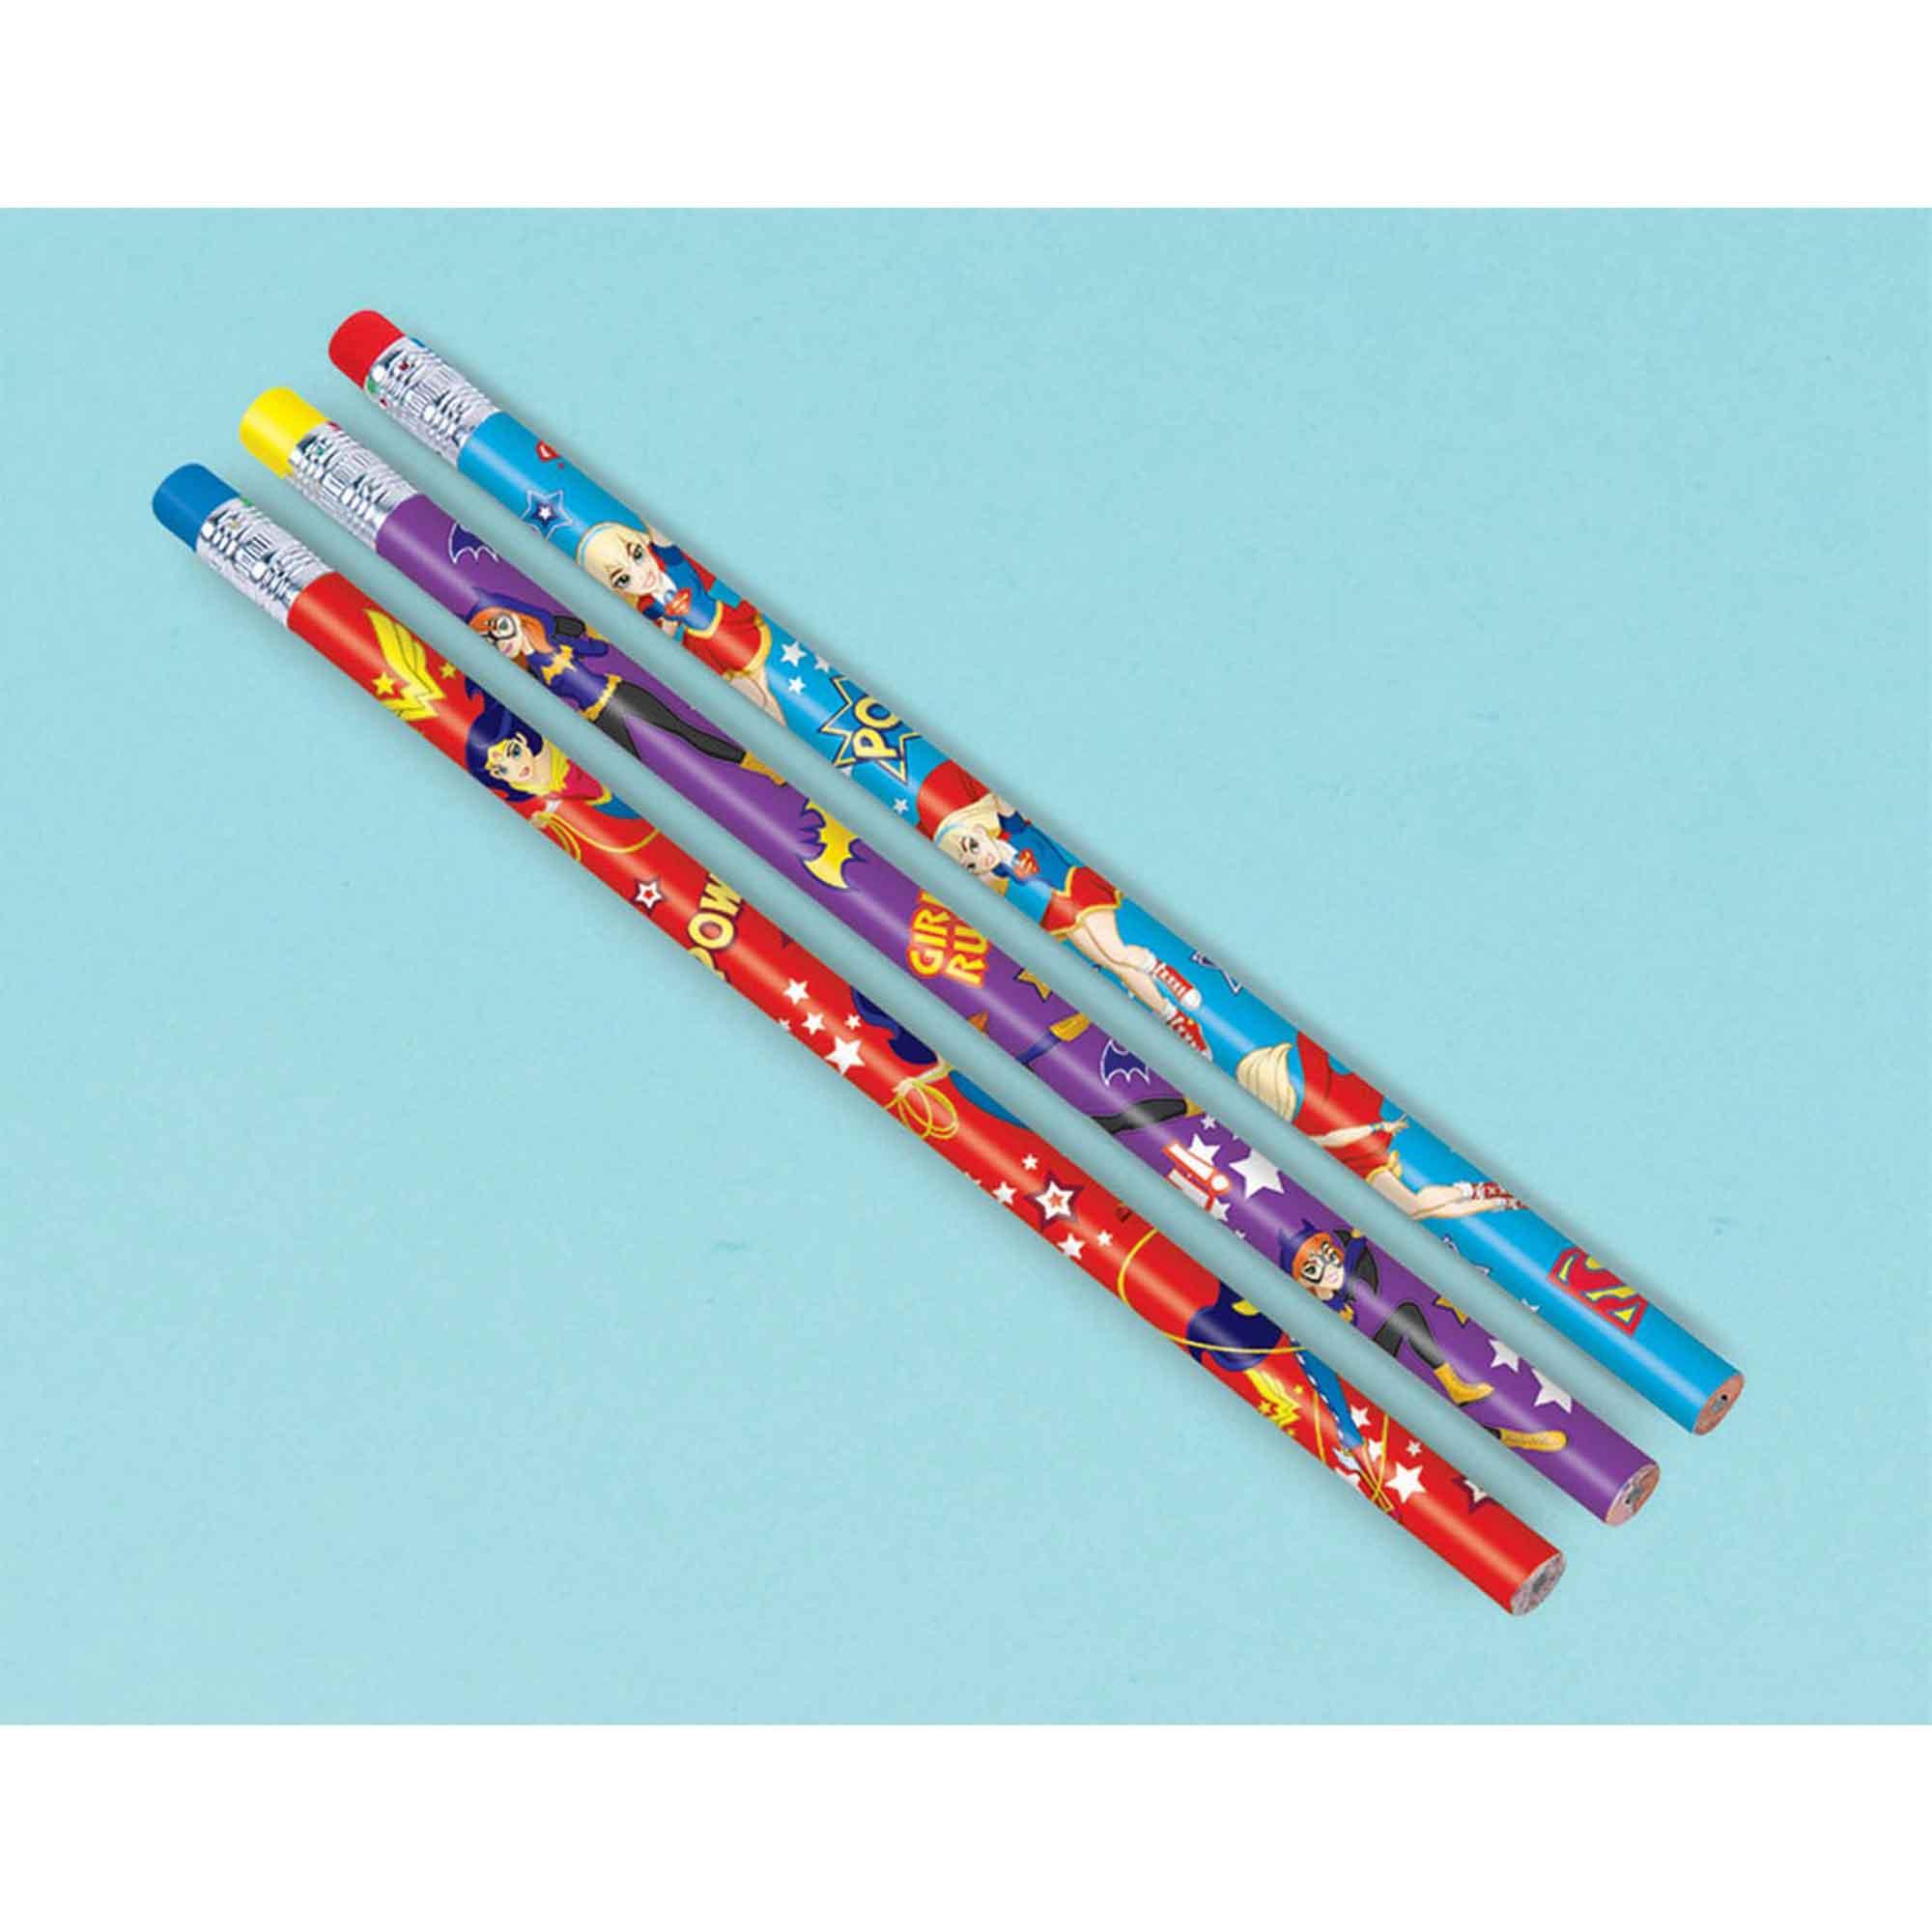 DC Superhero Girls Pencil Favor